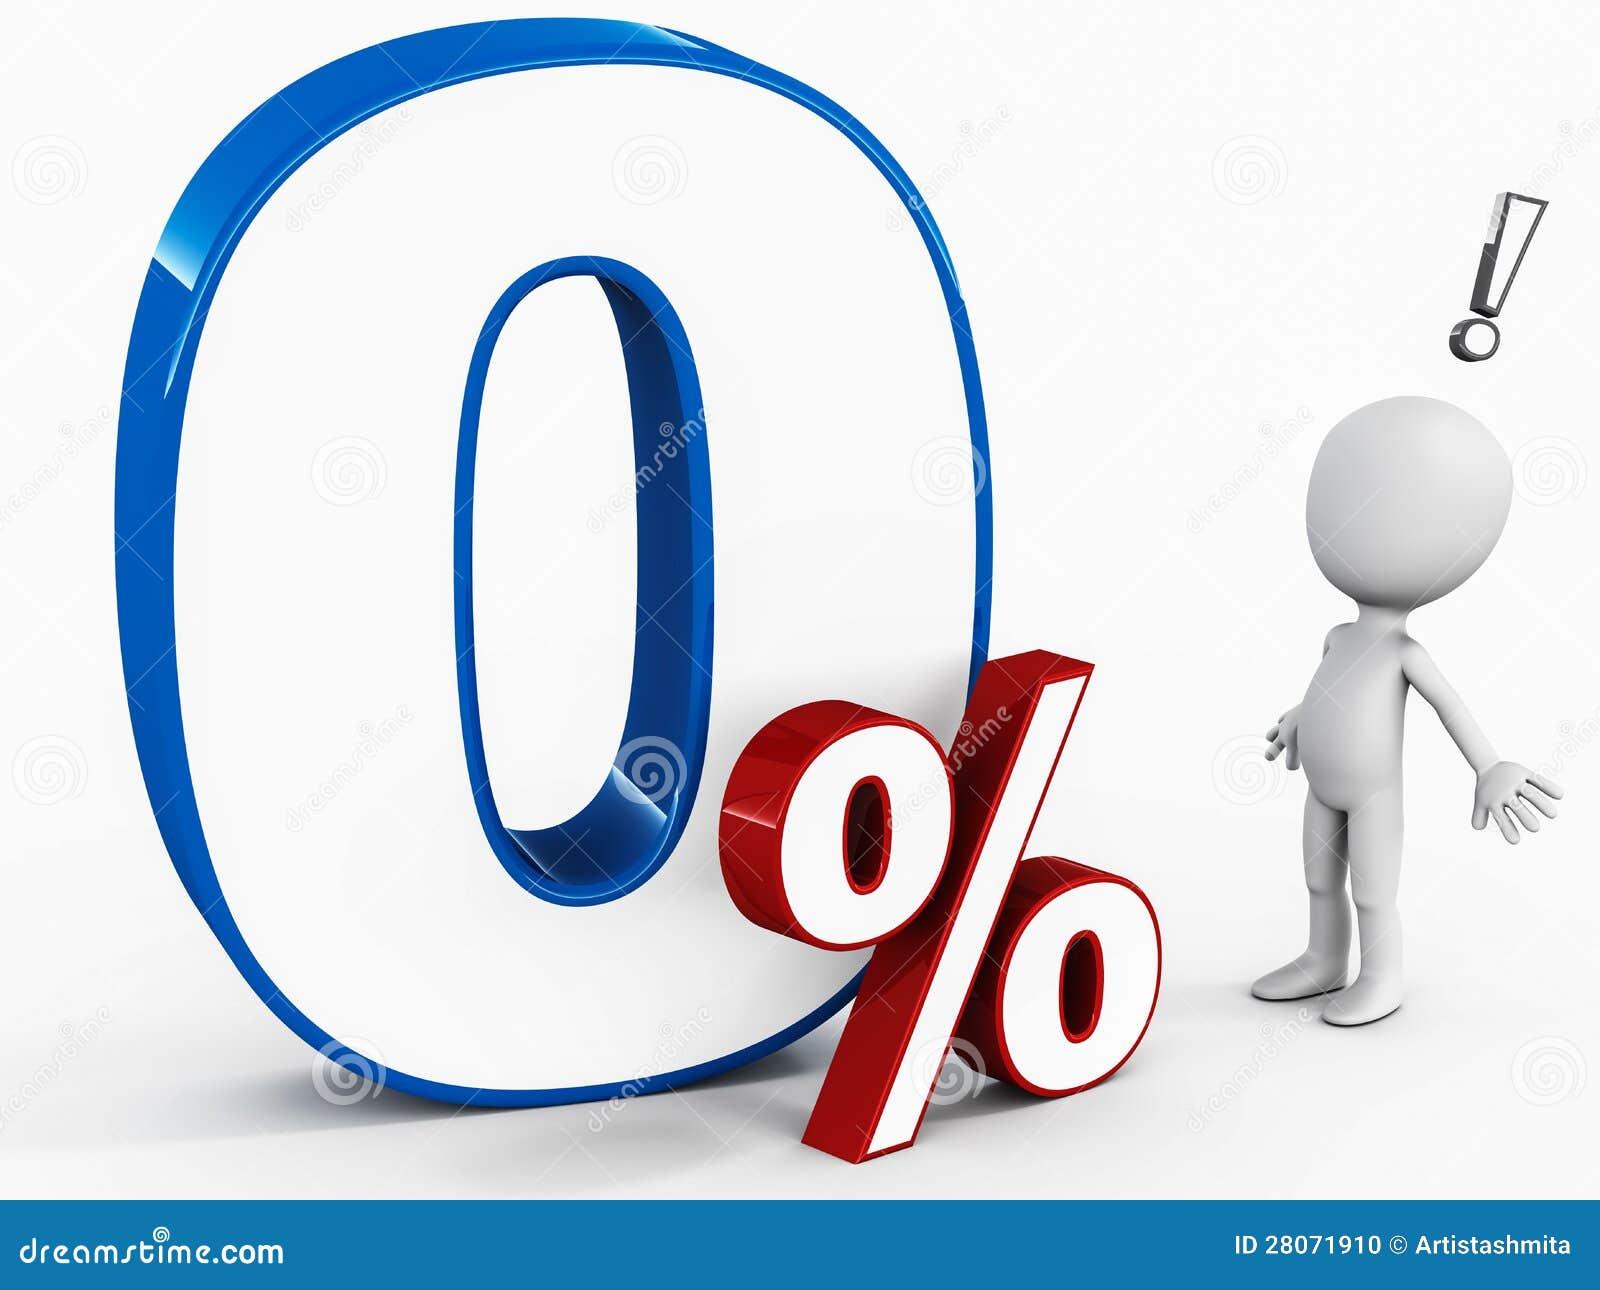 zero percent apr stock photo image 28071910. Black Bedroom Furniture Sets. Home Design Ideas